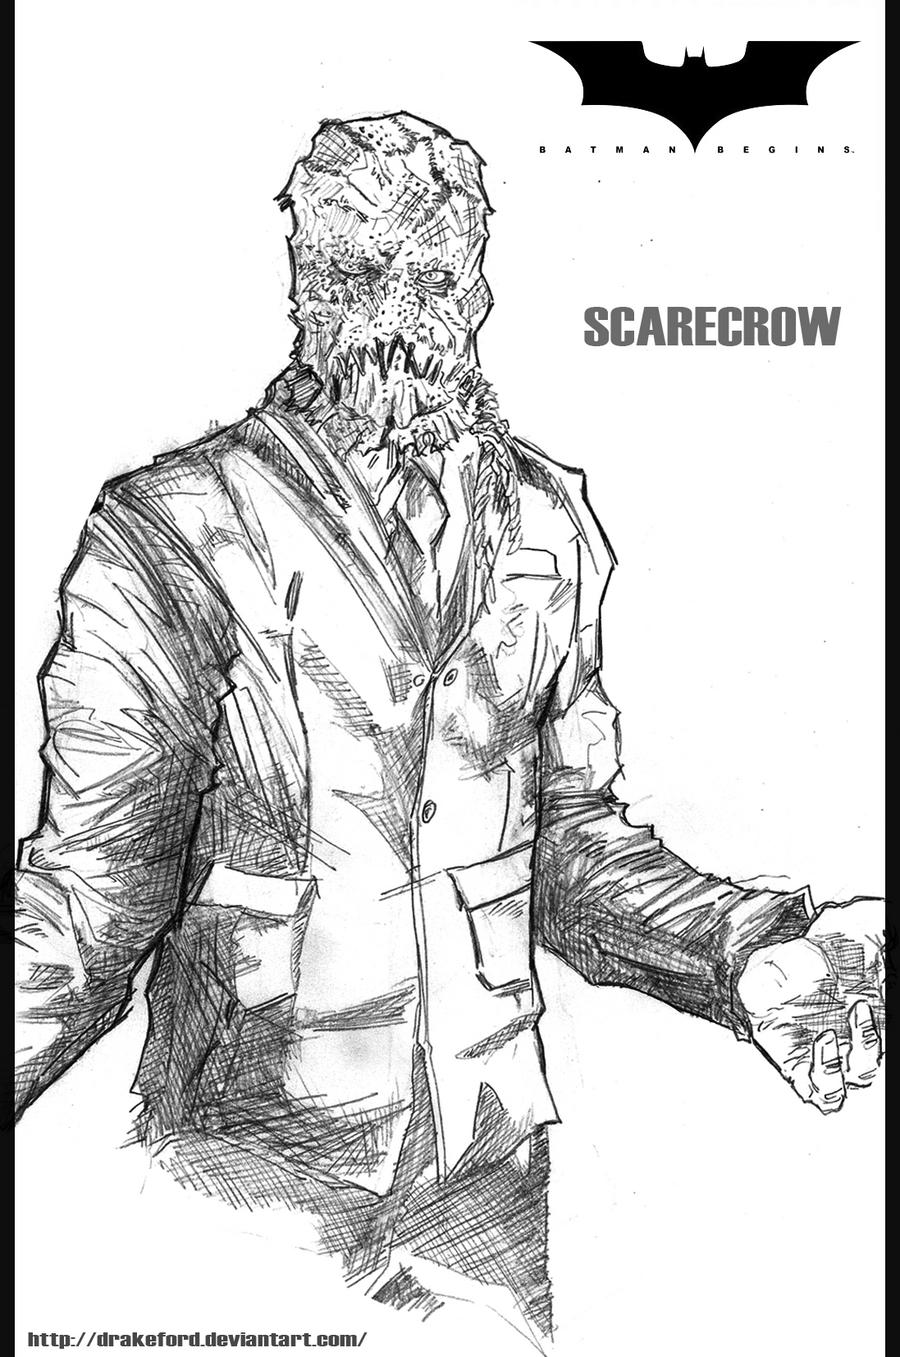 Batman Scarecrow Coloring Pages | Coloring Pages